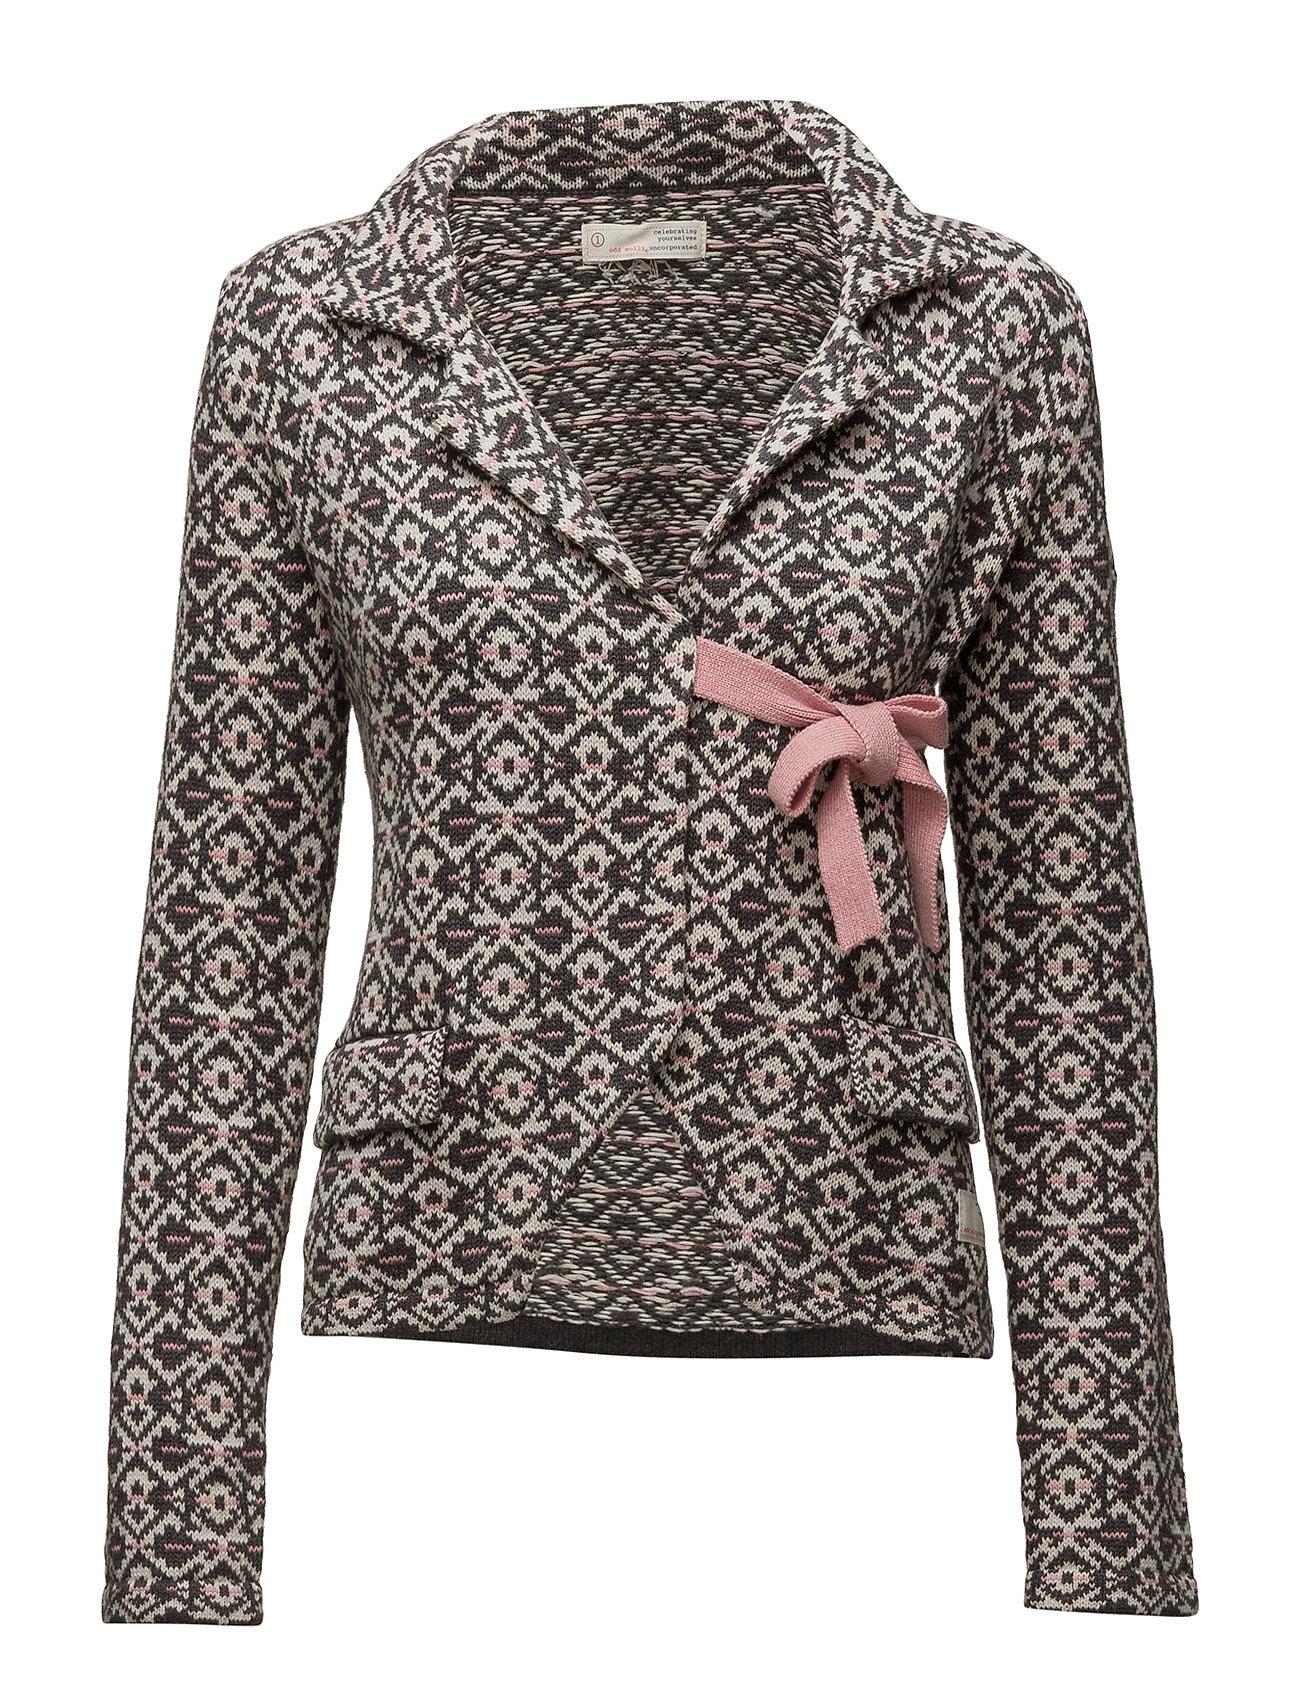 Lovely Knit Jacket ODD MOLLY Striktøj til Kvinder i